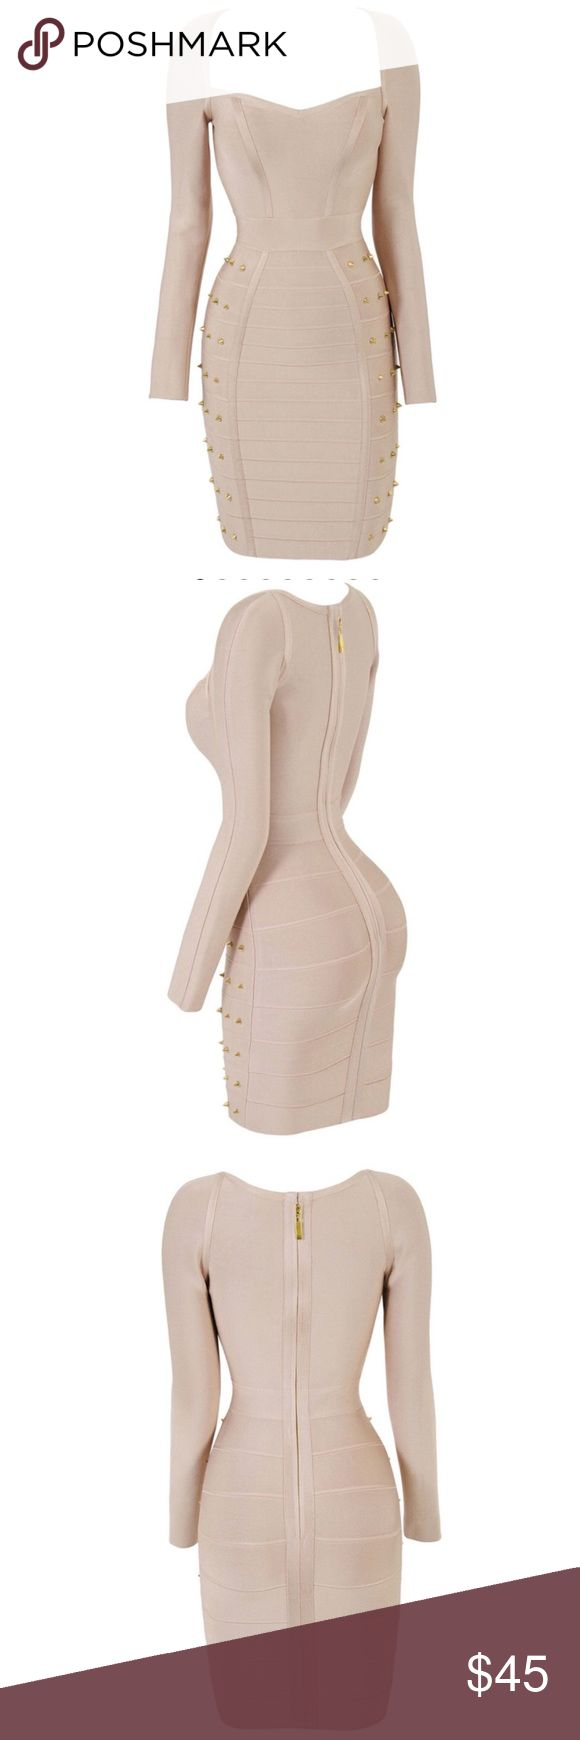 Selling this Celeb Boutique Elisa nude long sleeve dress on Poshmark! My username is: li820. #shopmycloset #poshmark #fashion #shopping #style #forsale #Celeb Boutique #Dresses & Skirts